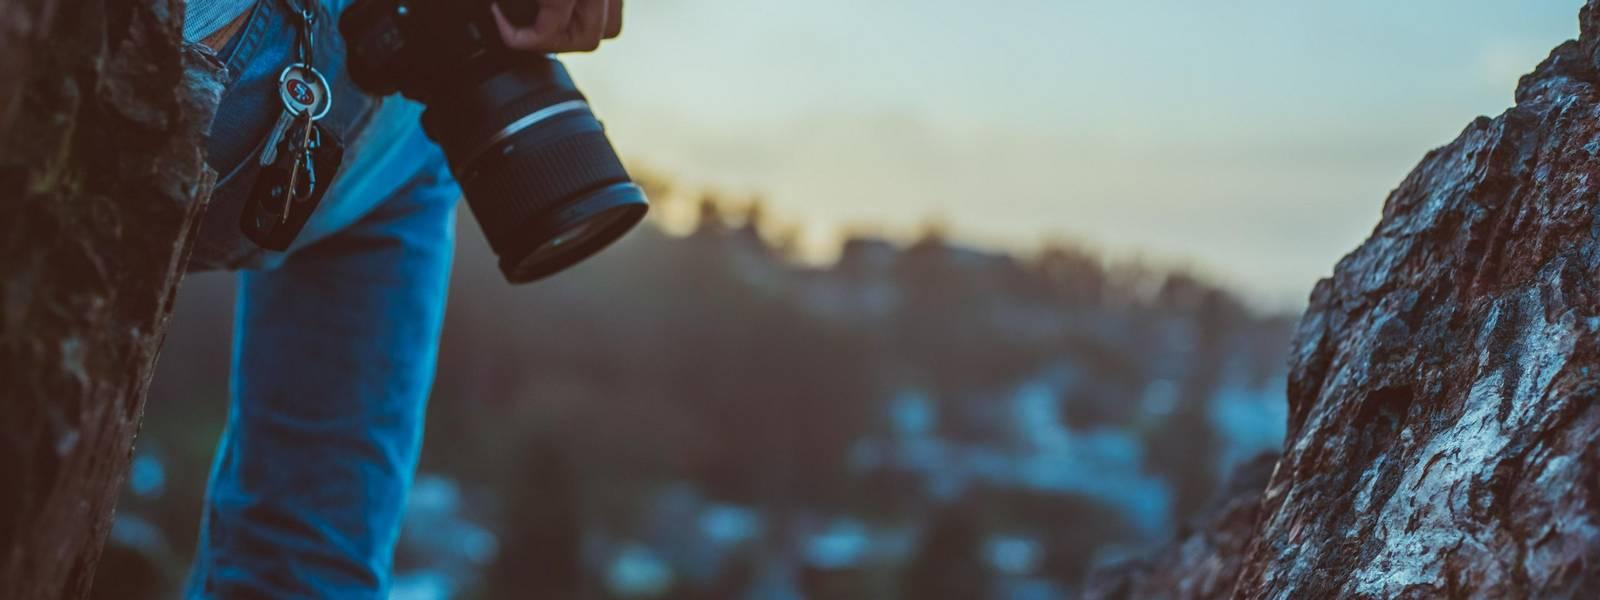 Photography-Adult-Pexels368893.jpg